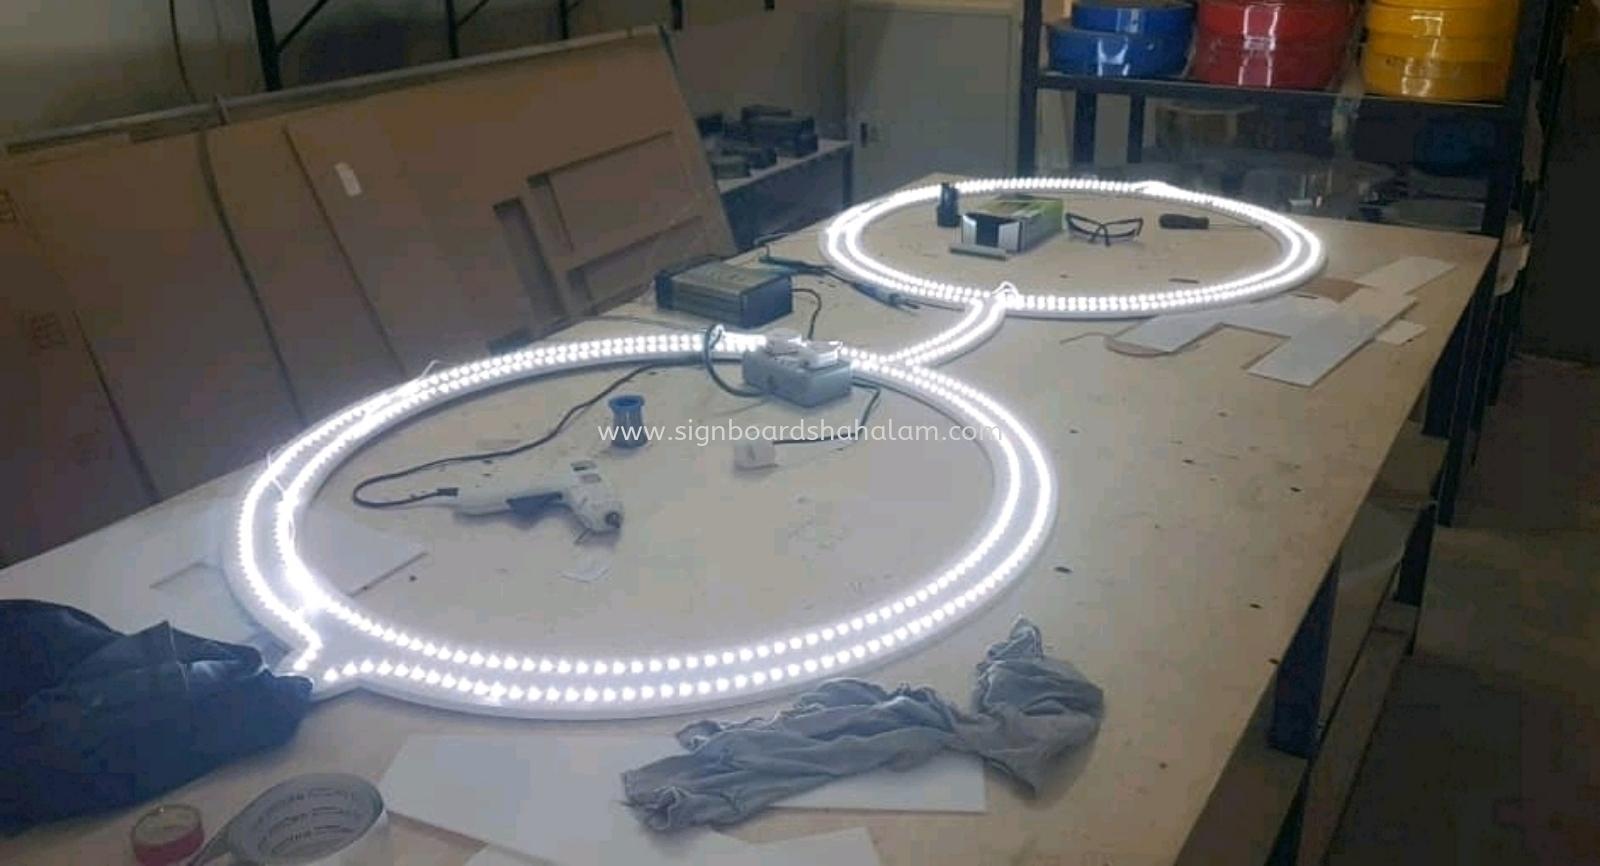 3D Box Up LED Fronlit Signboard